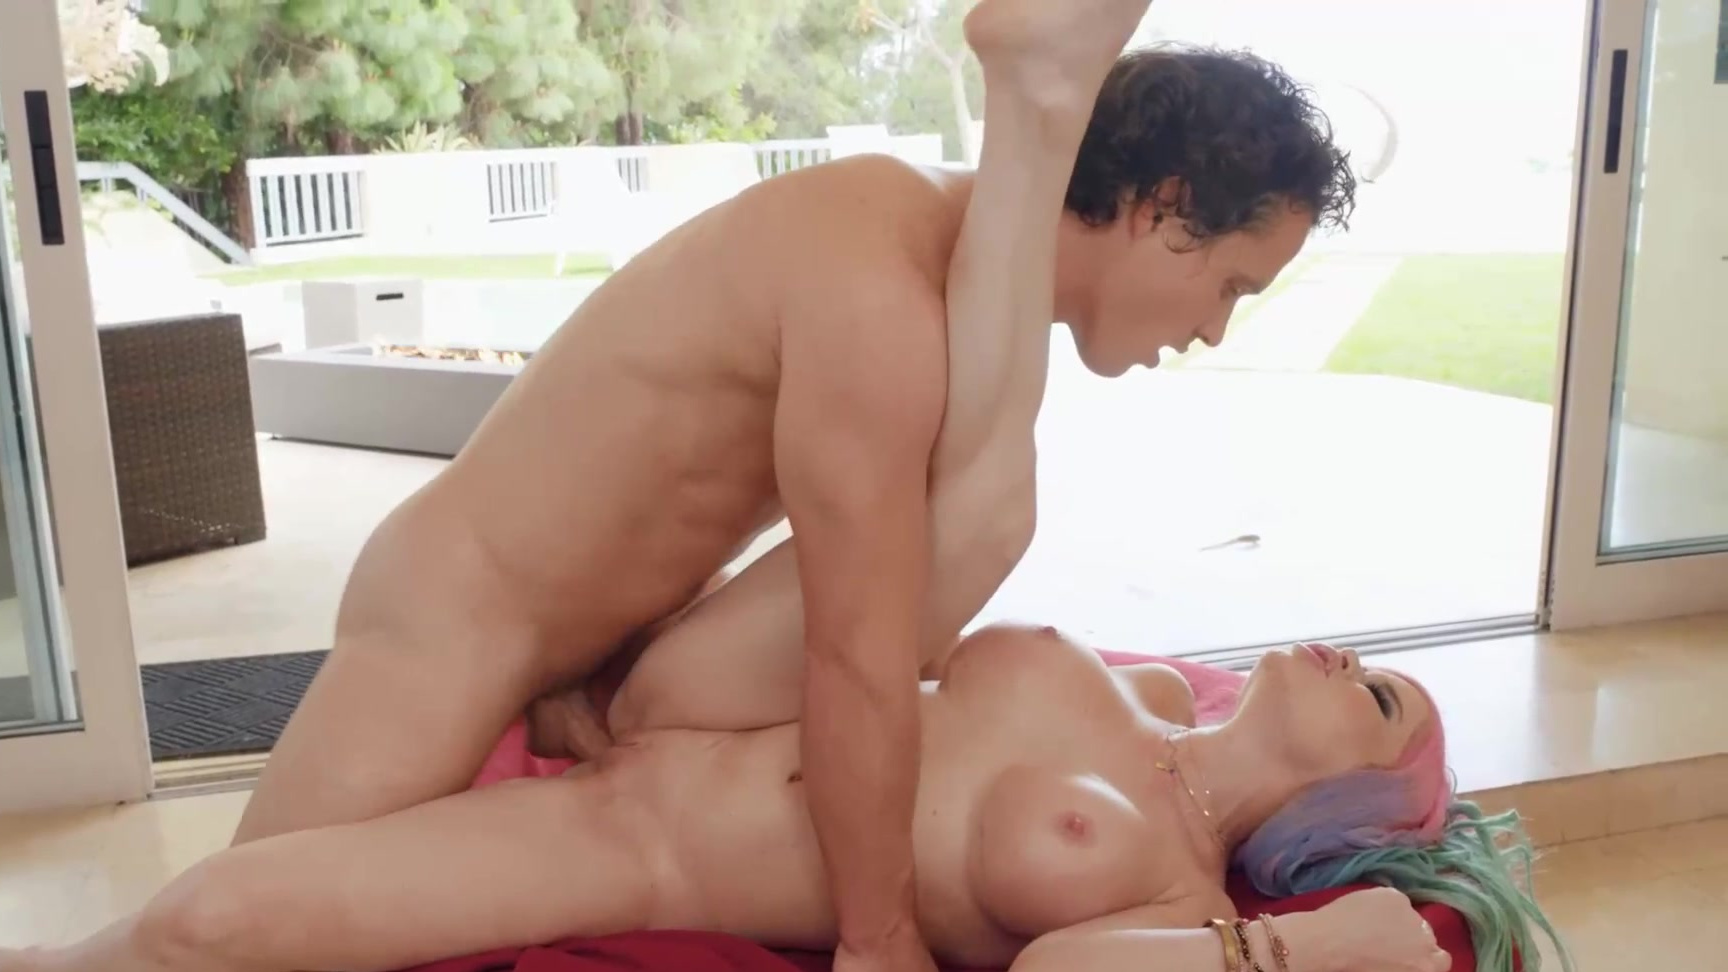 Amazing Anal busty beauty nikki delano amazing anal fuck session (robby